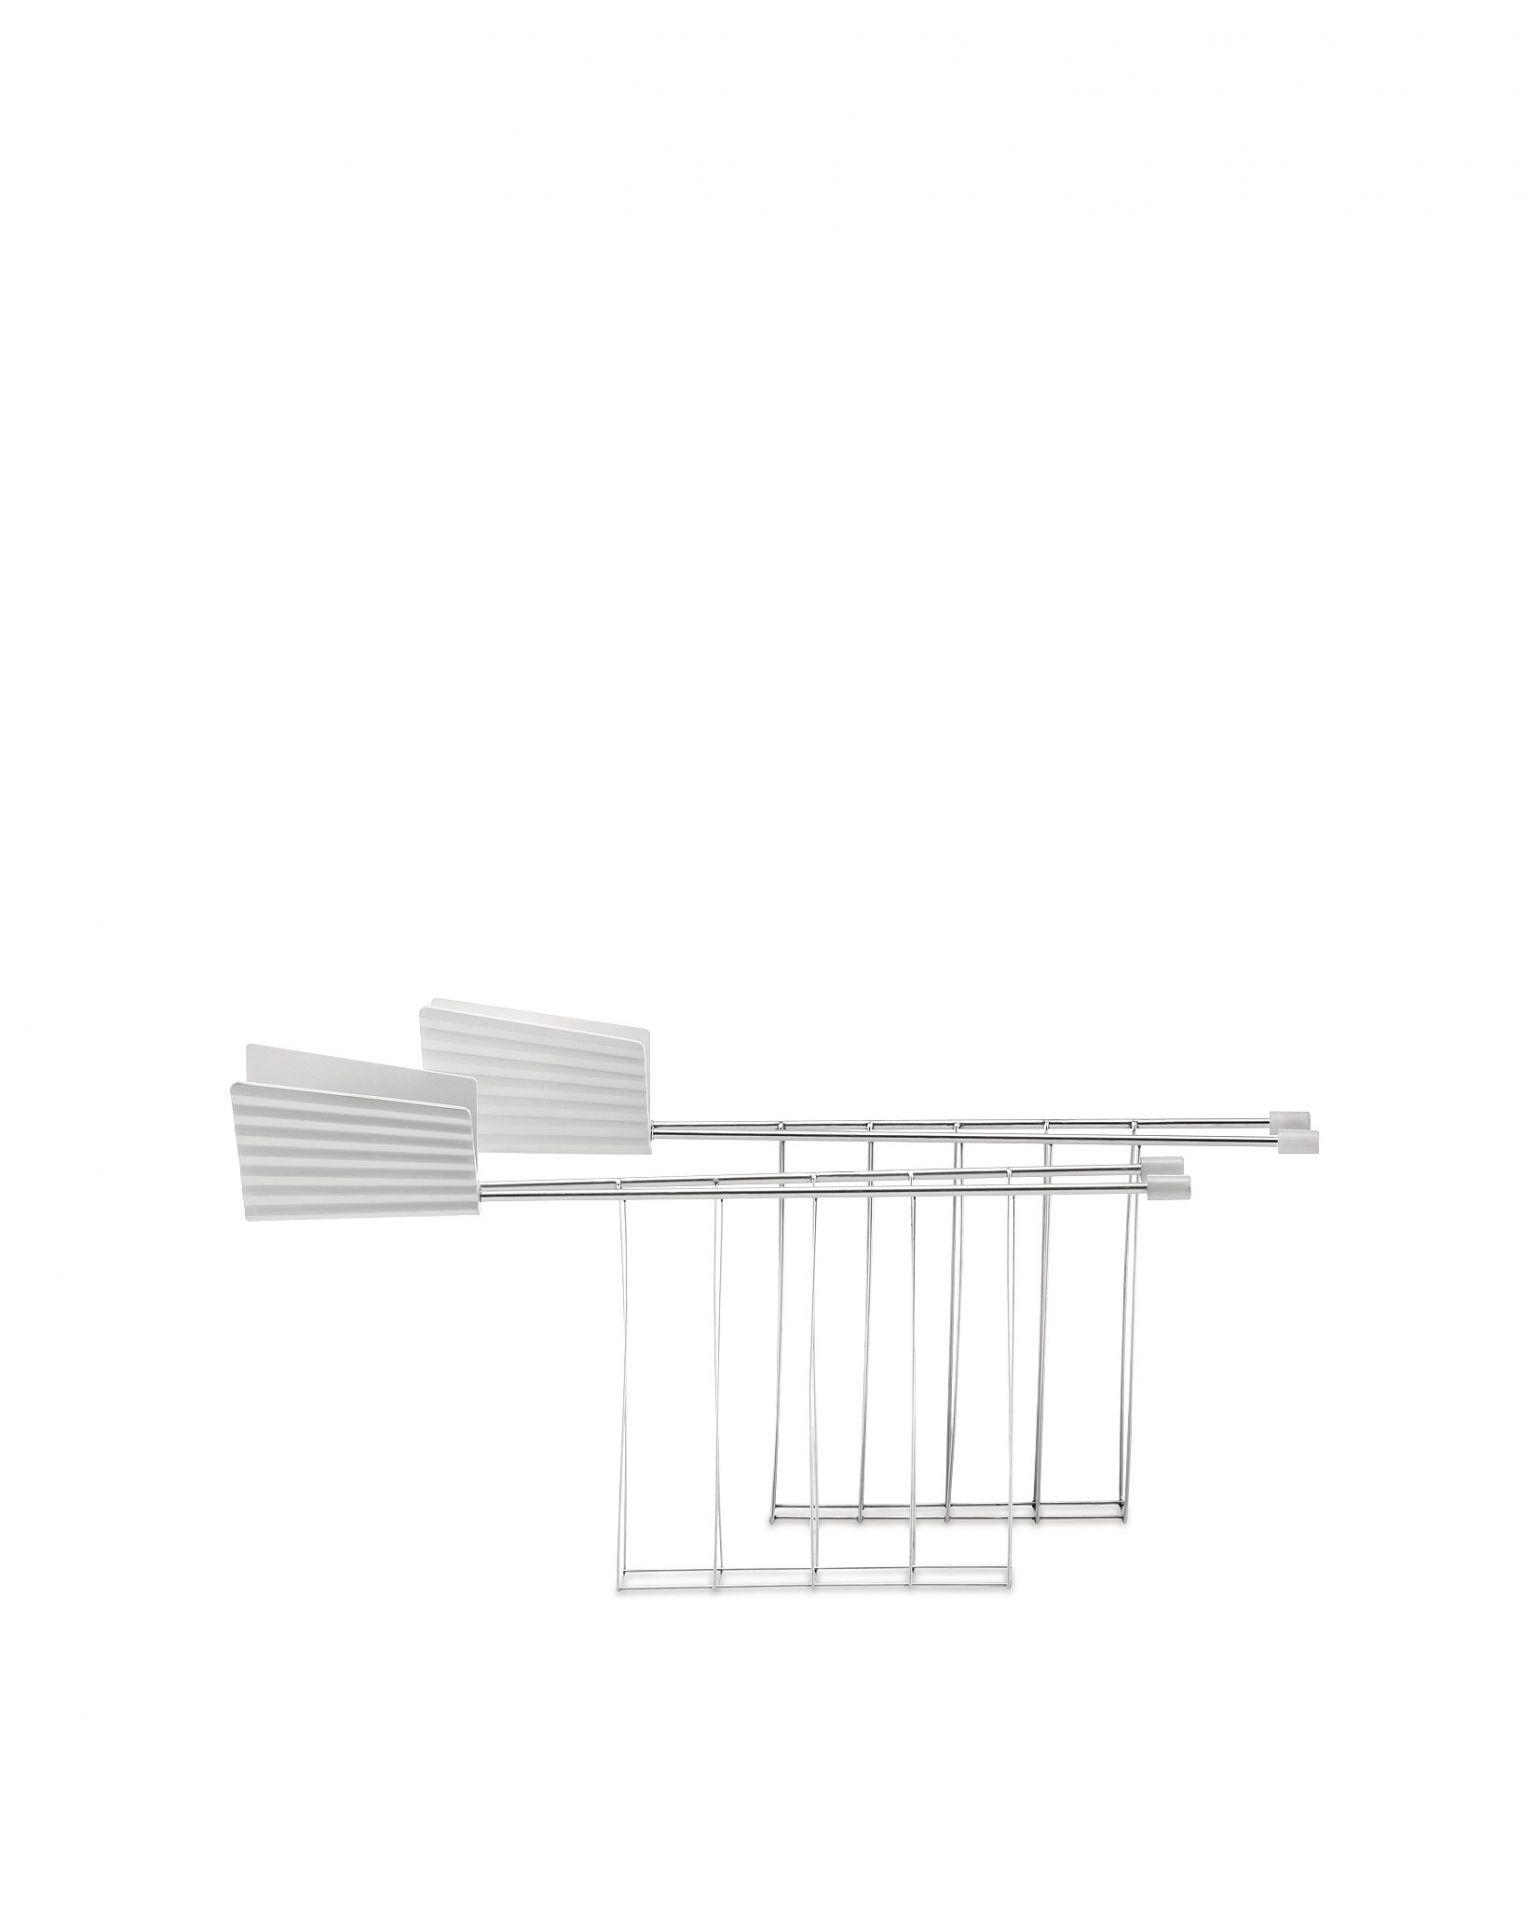 MDL08RACK Plissé Toasterzangen 2er-Set Alessi